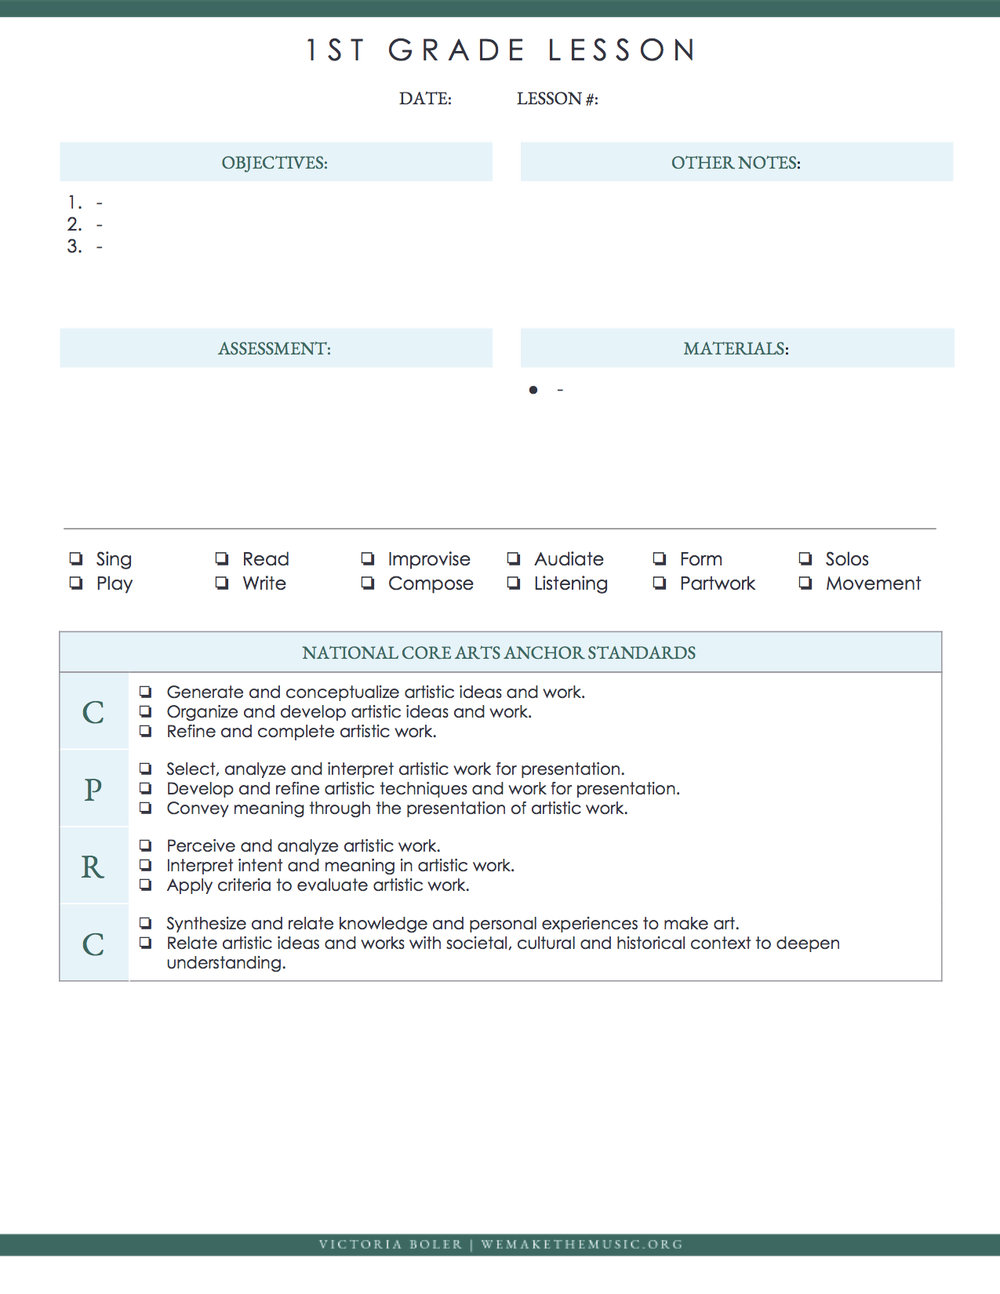 Grade 1 Lesson Plan.jpg